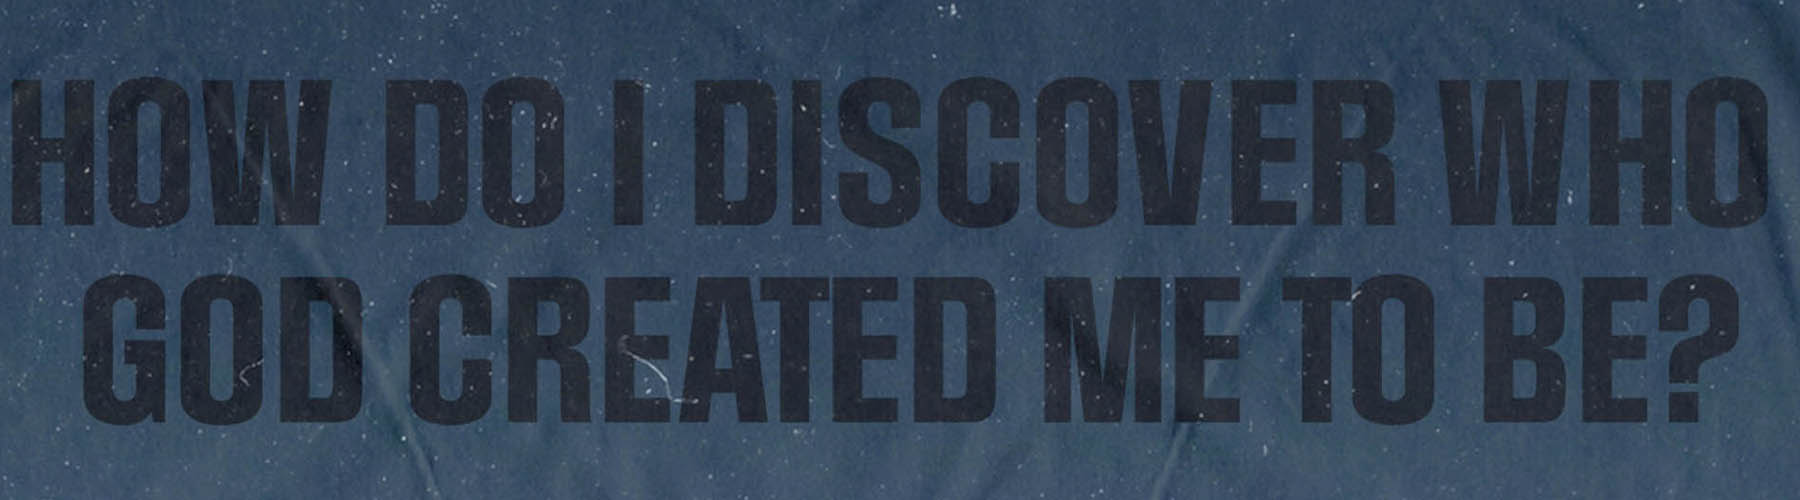 How Do I Discover Who God Created Me to Be?